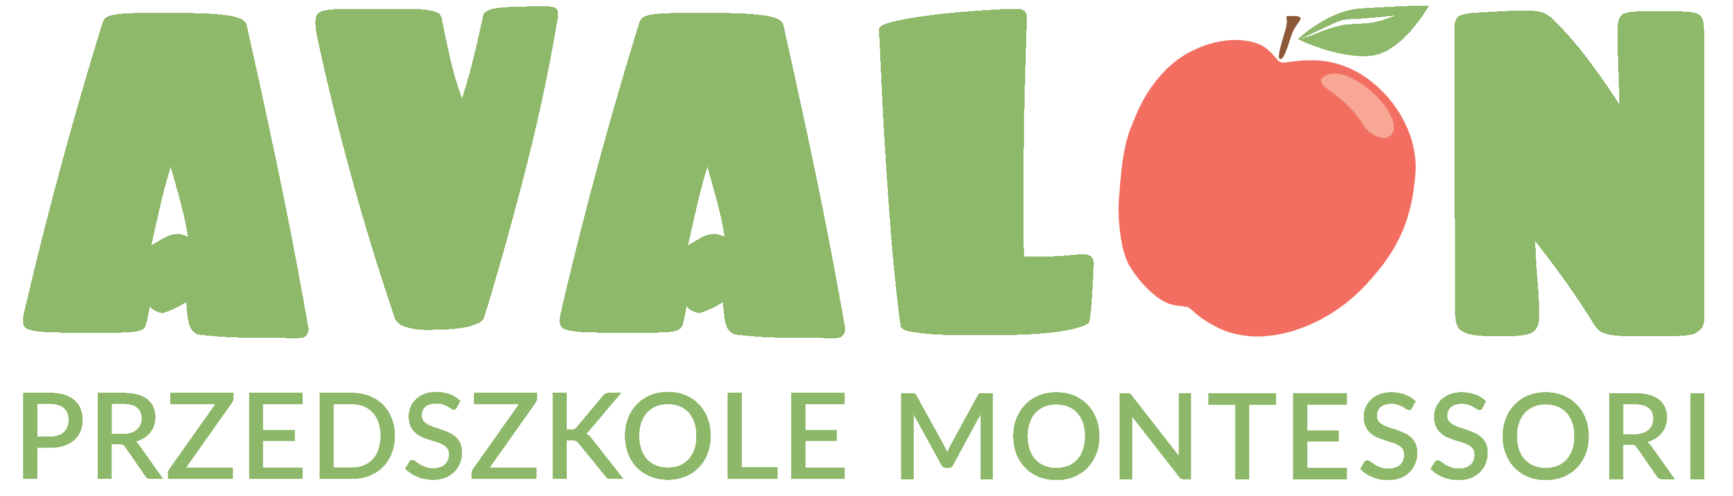 Avalon Przedszkole Montessori